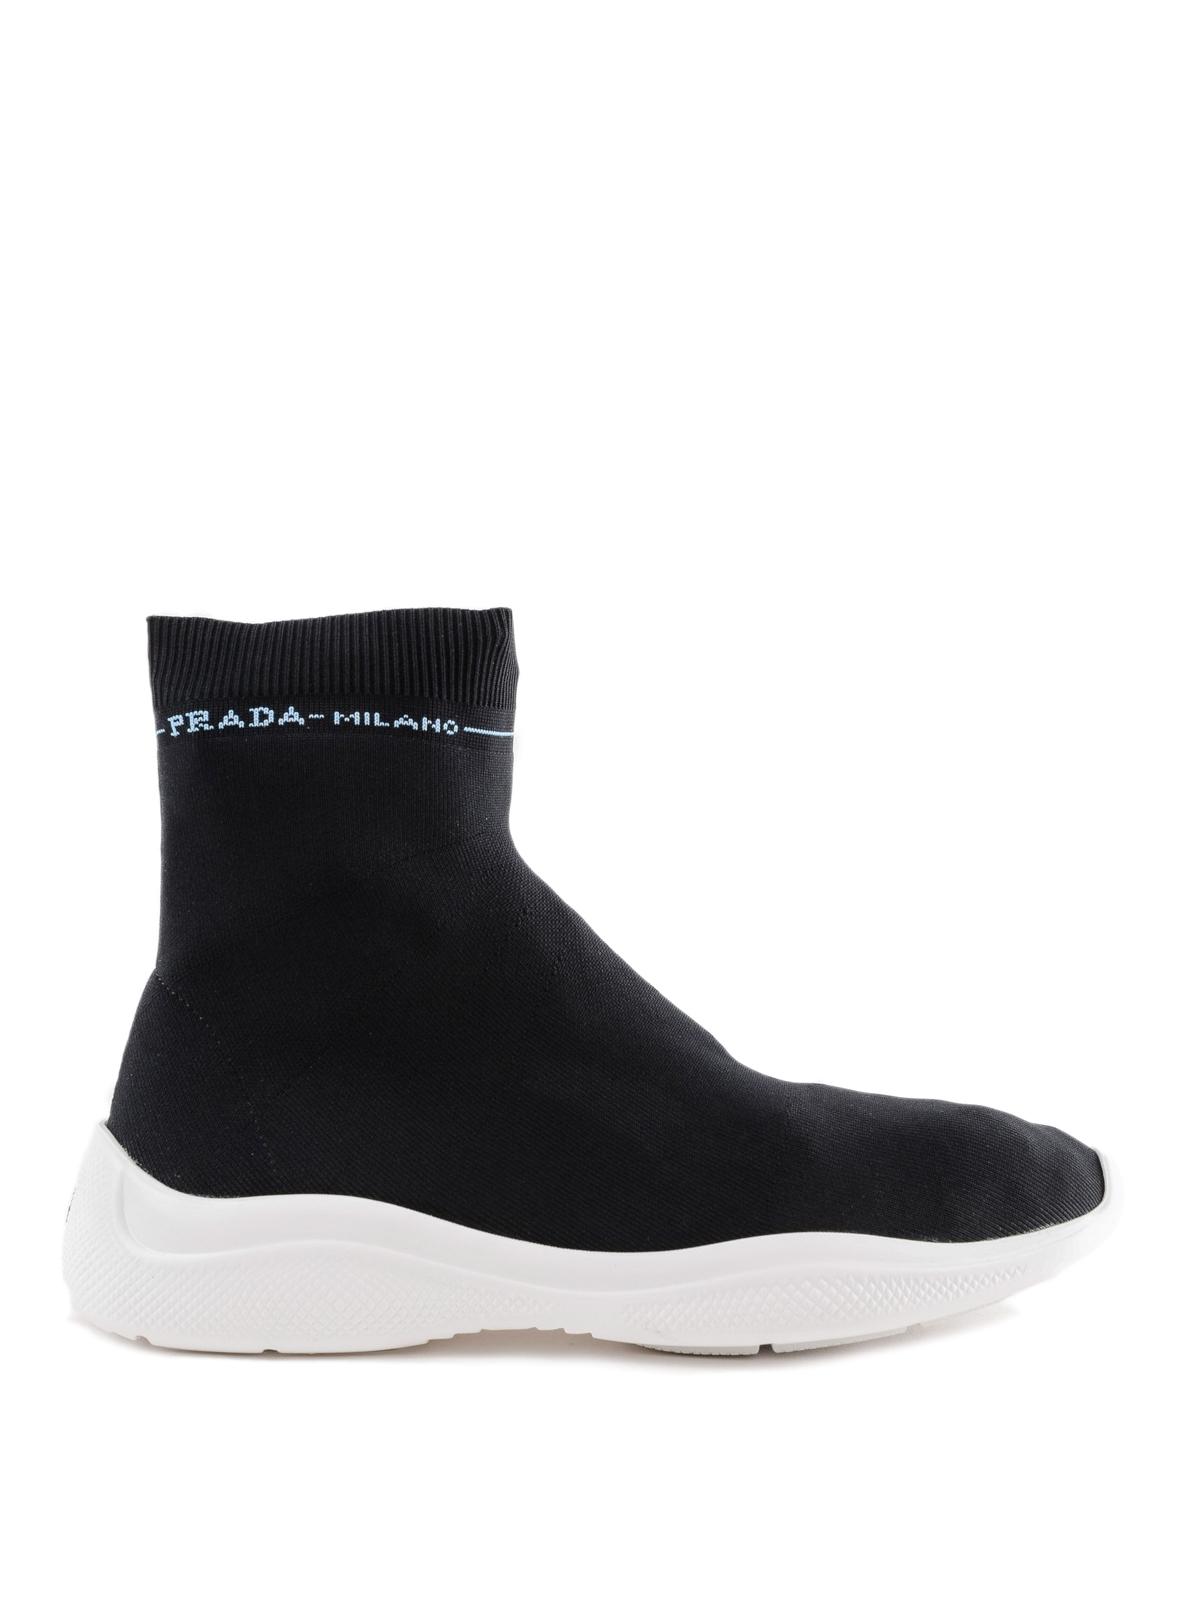 Black stretch fabric sock slip-ons